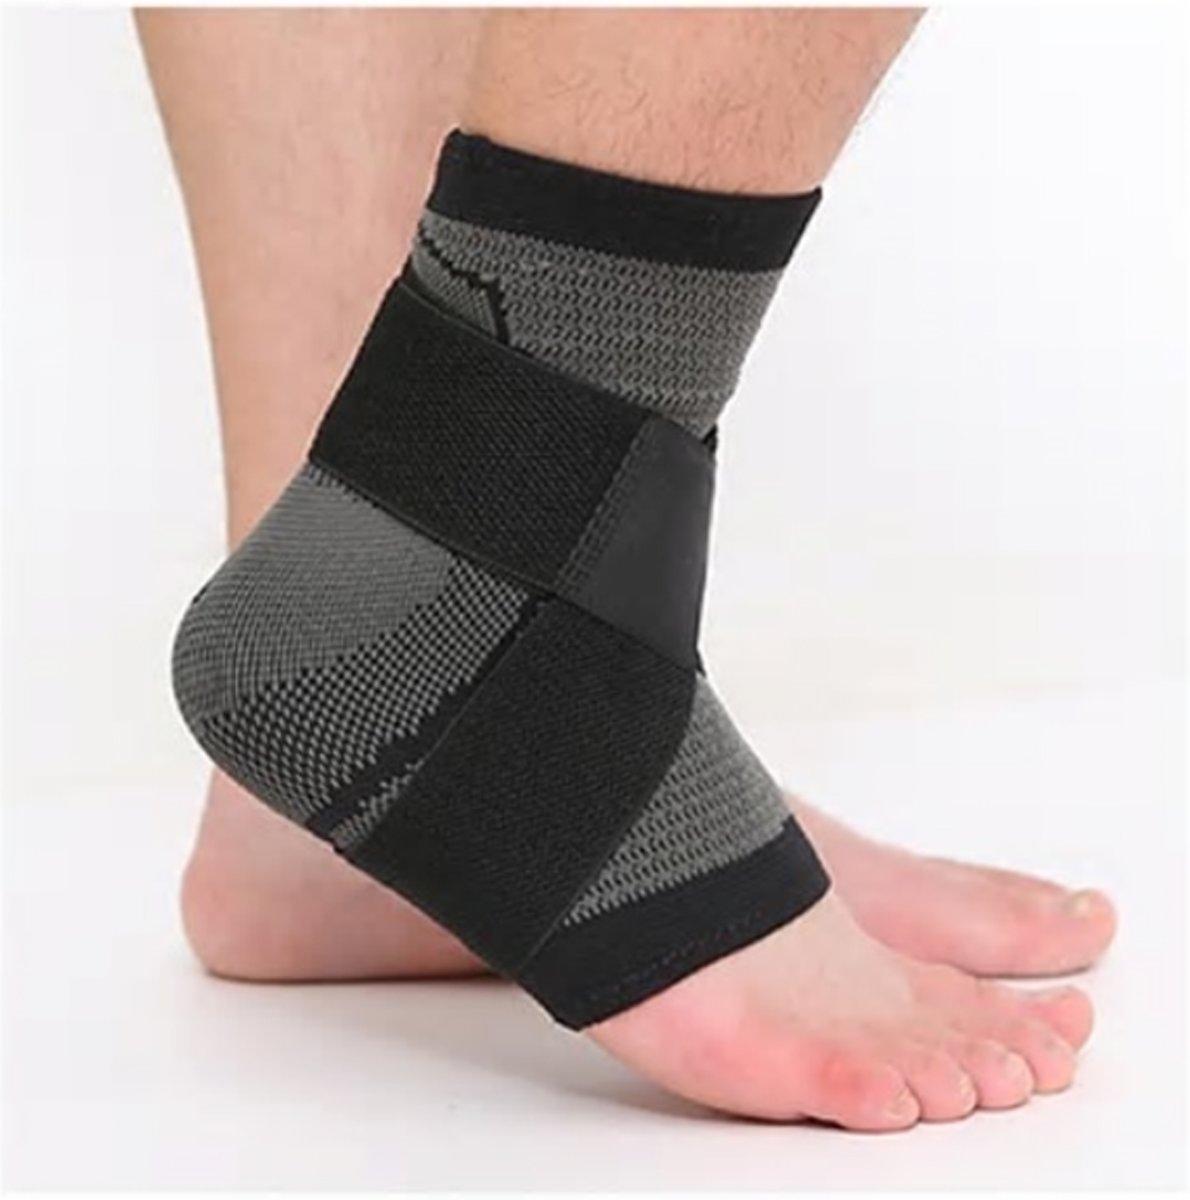 Enkelbrace Enkelbandage Band - Straps - Ortho Stretch Compressie - Enkelsleeve - Medium Enkel bescherming en ondersteuning - Lichtgewicht Zwart - Maat XL